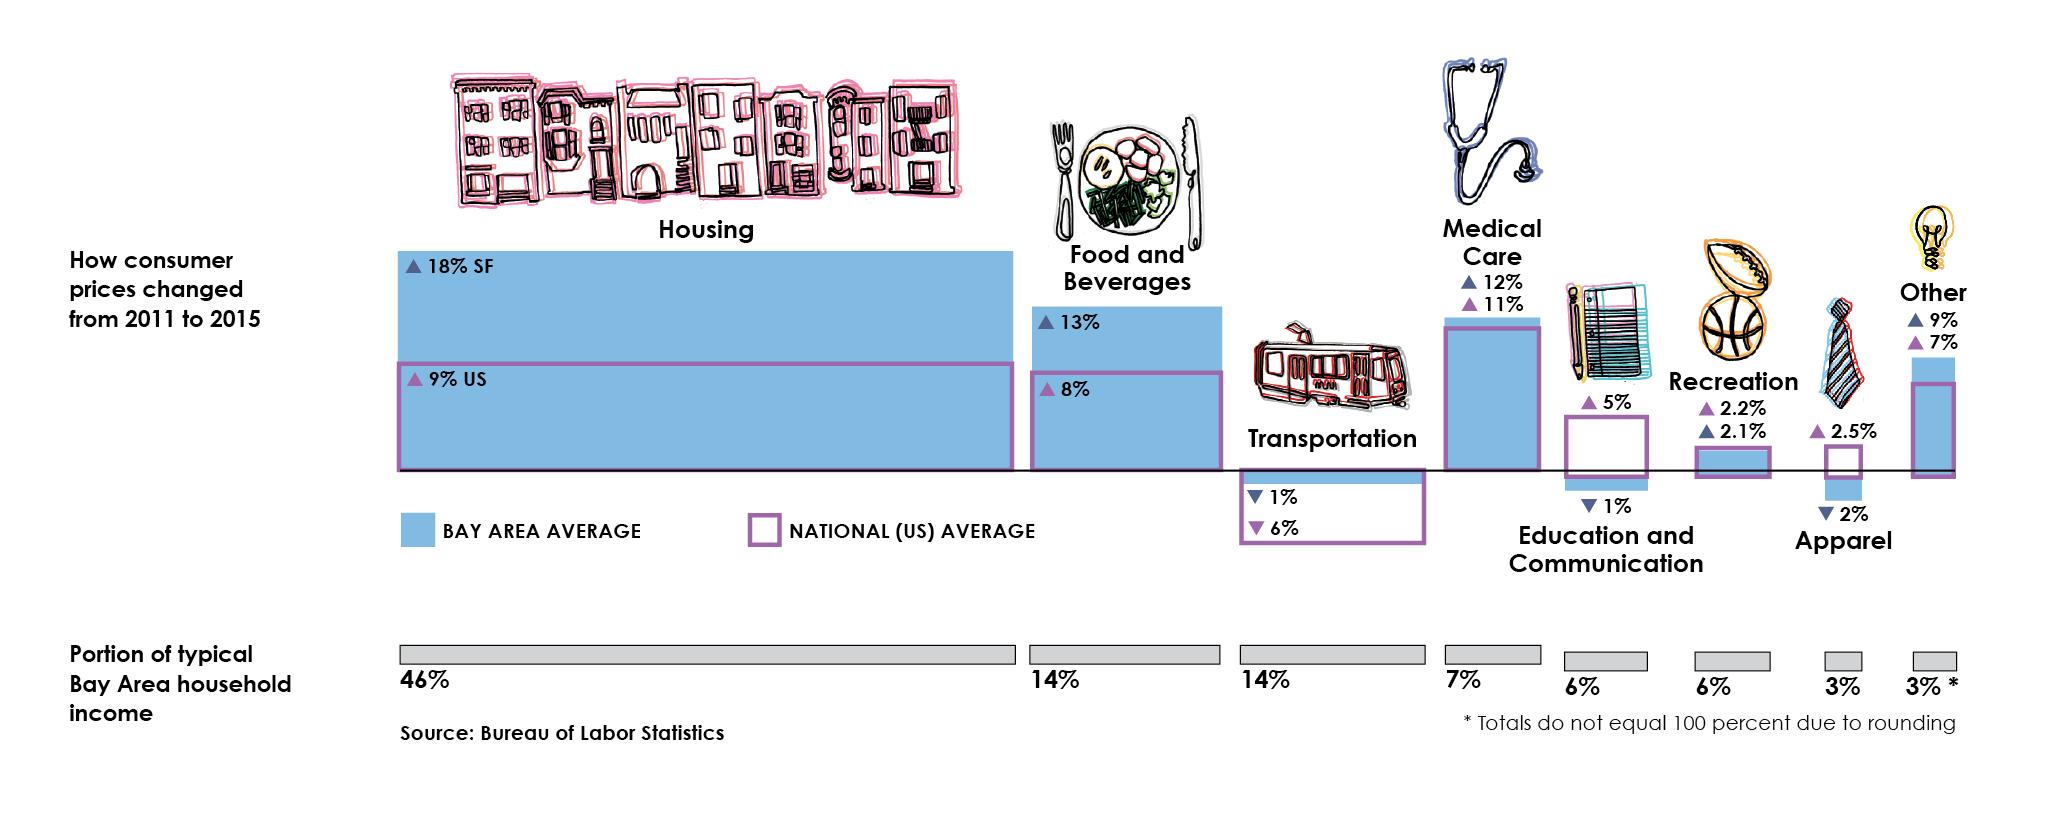 consumer_prices_bay_area_versus_us.png